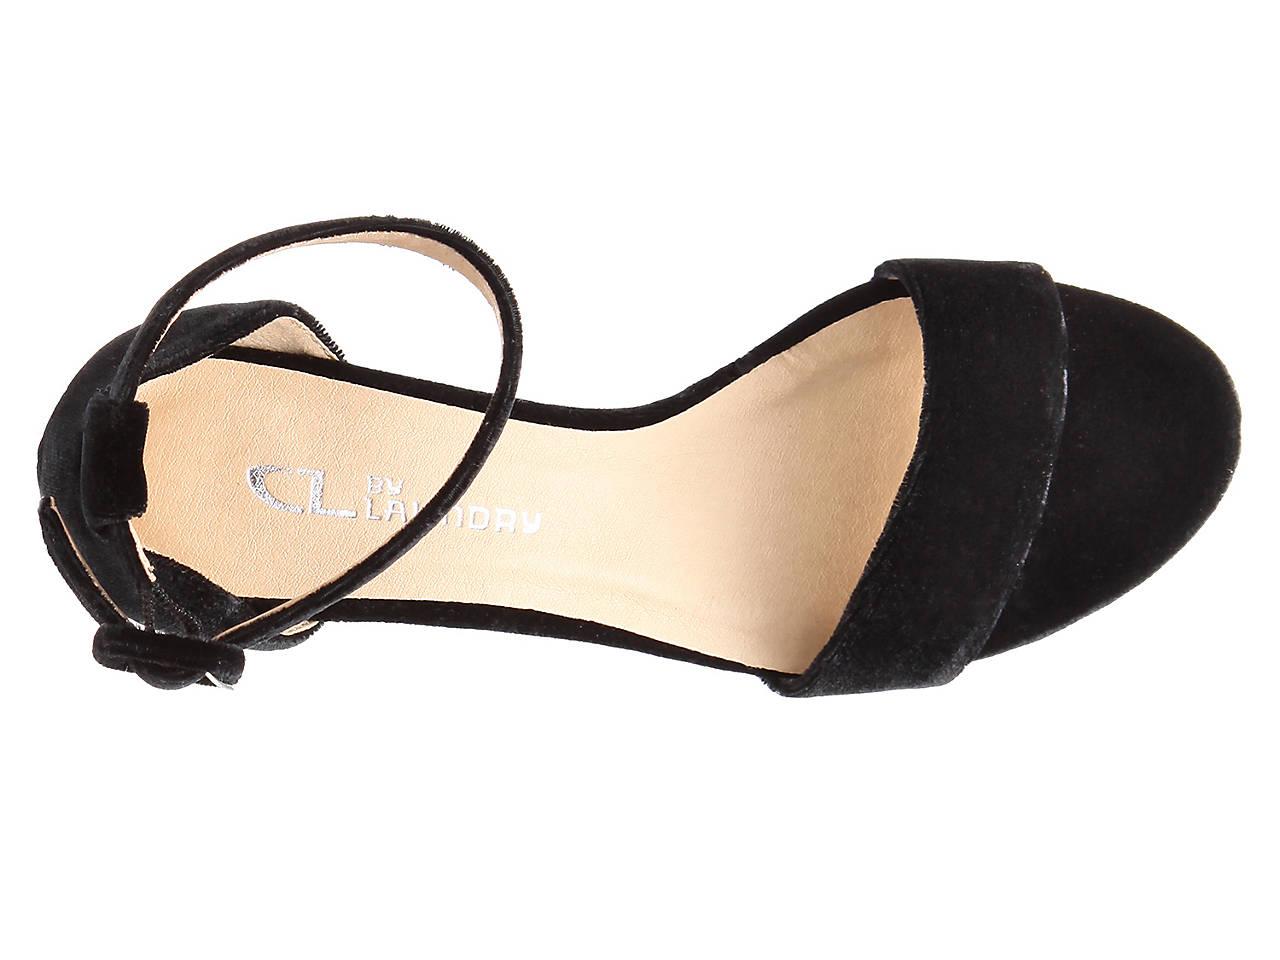 Cl By Laundry Jody Velvet Sandal Women S Shoes Dsw